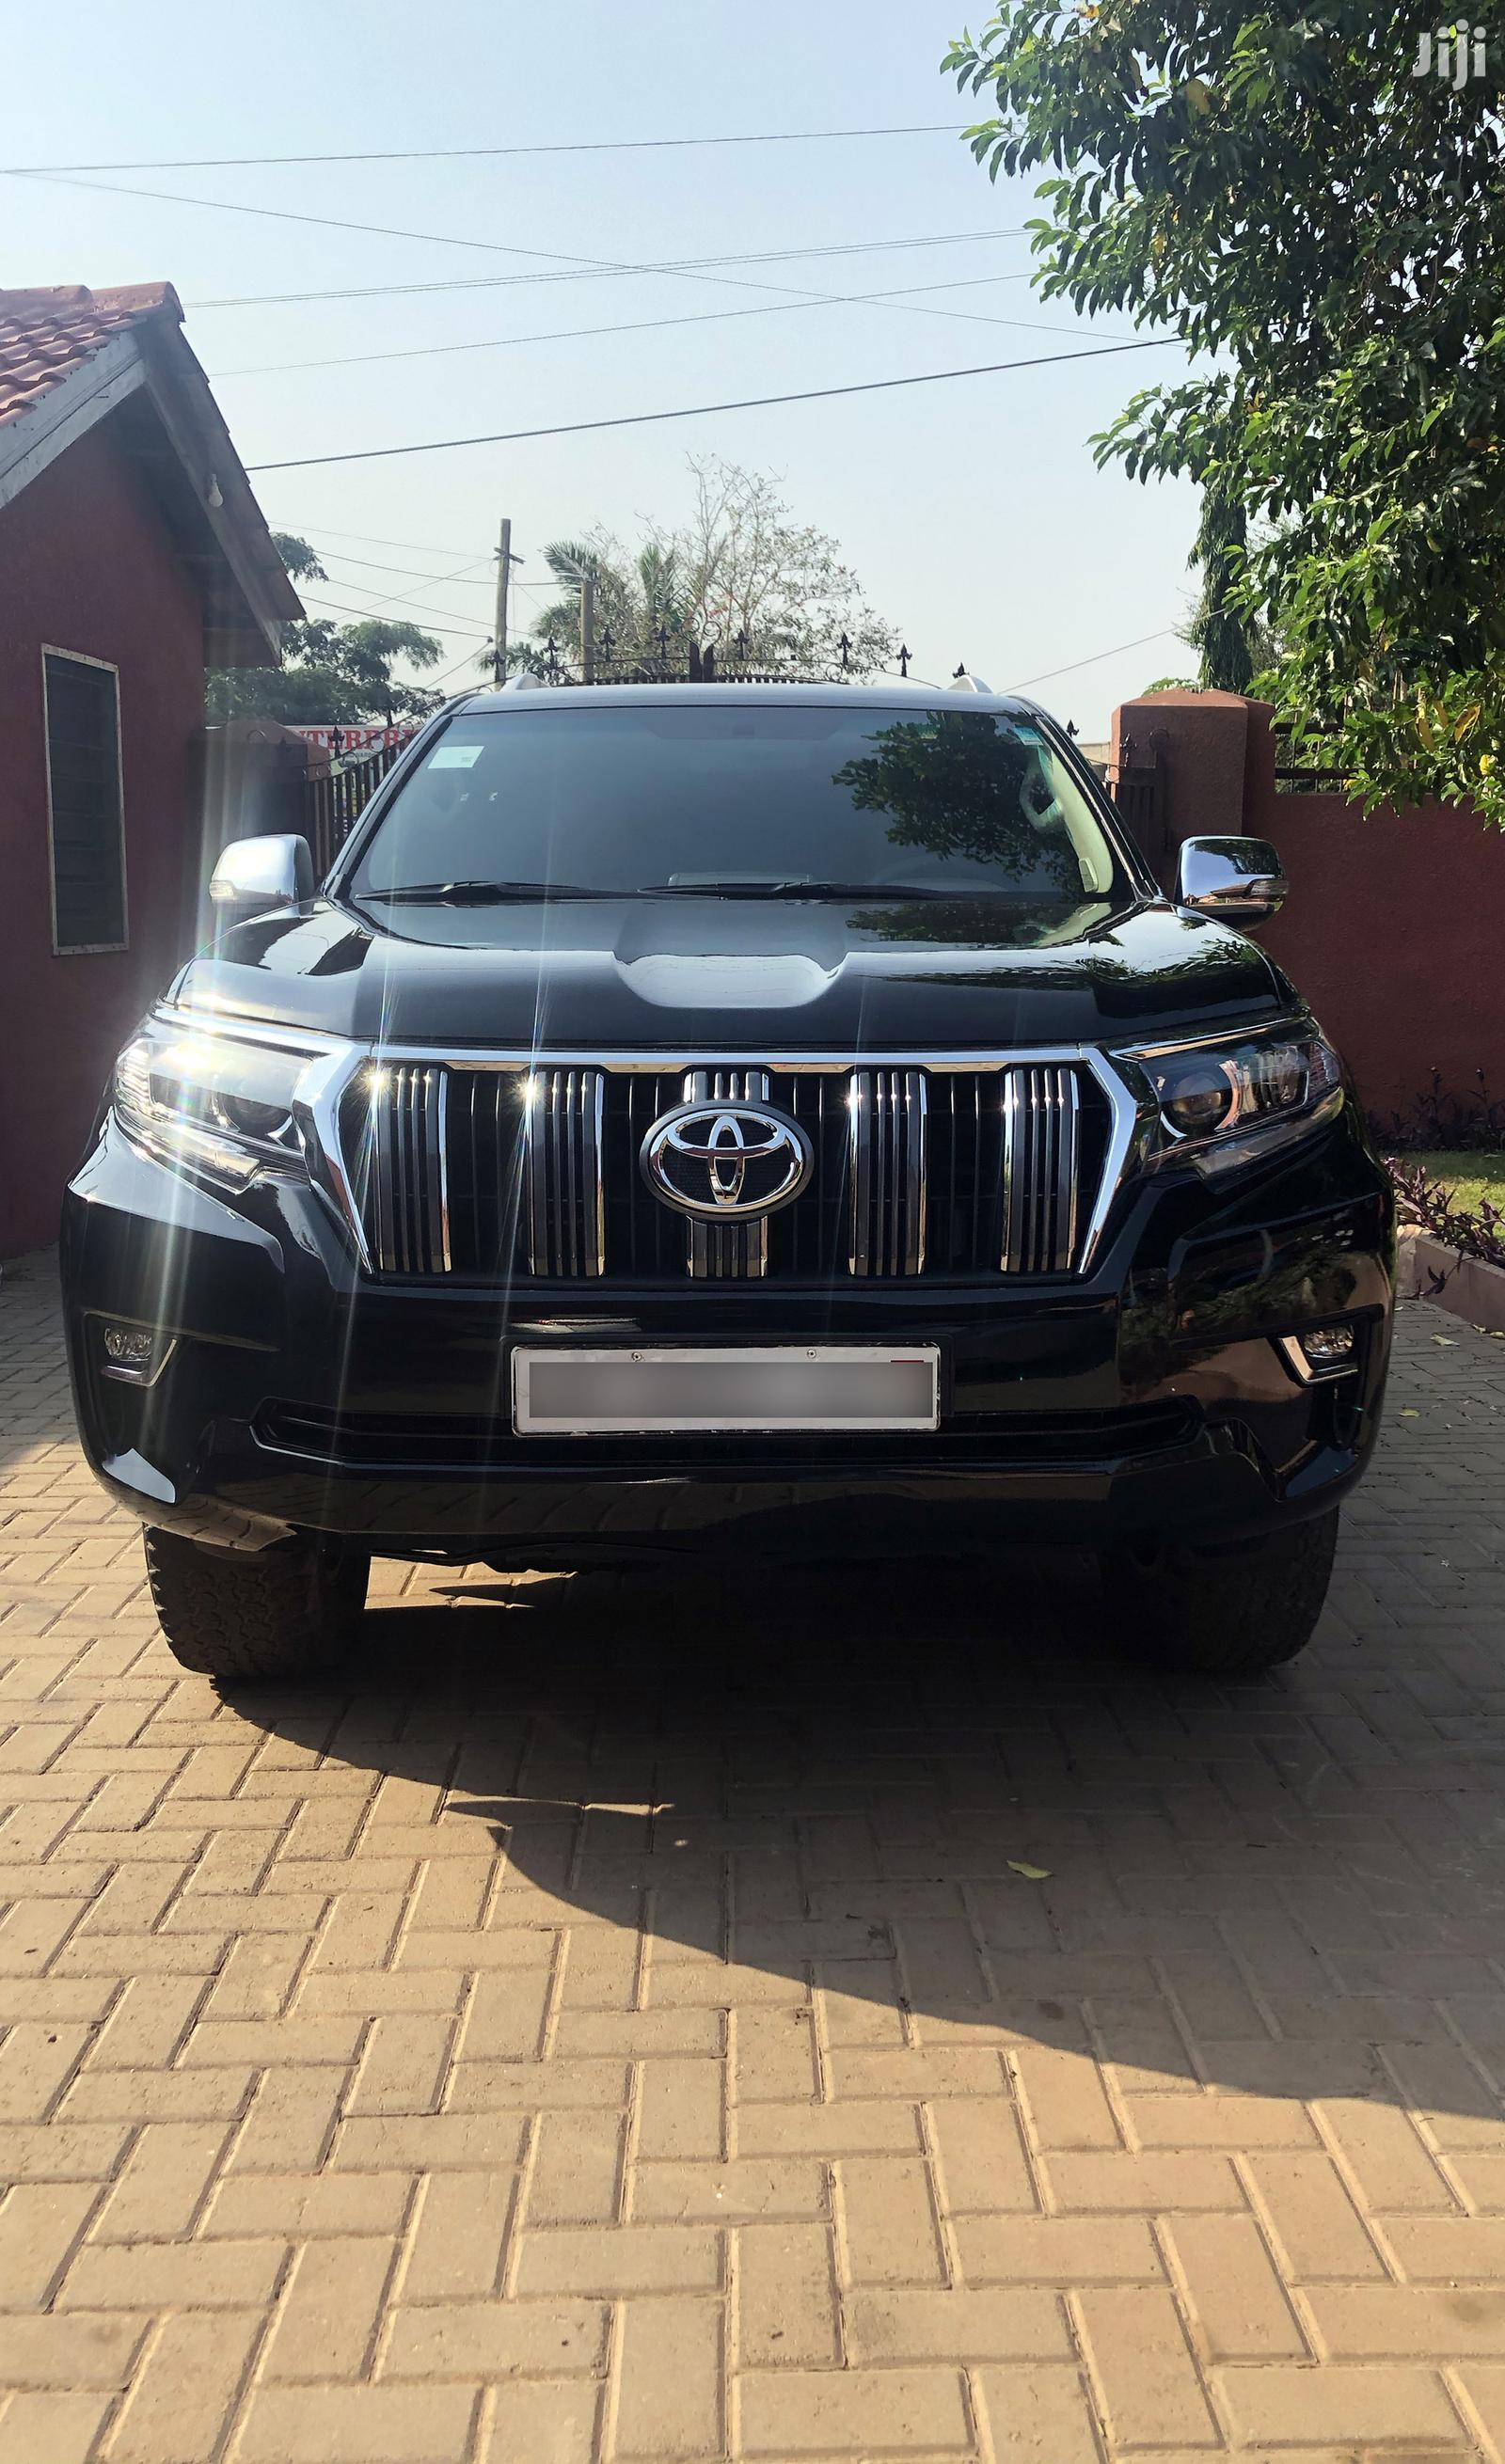 Toyota Land Cruiser Prado 2012 GXL Black | Cars for sale in East Legon, Greater Accra, Ghana